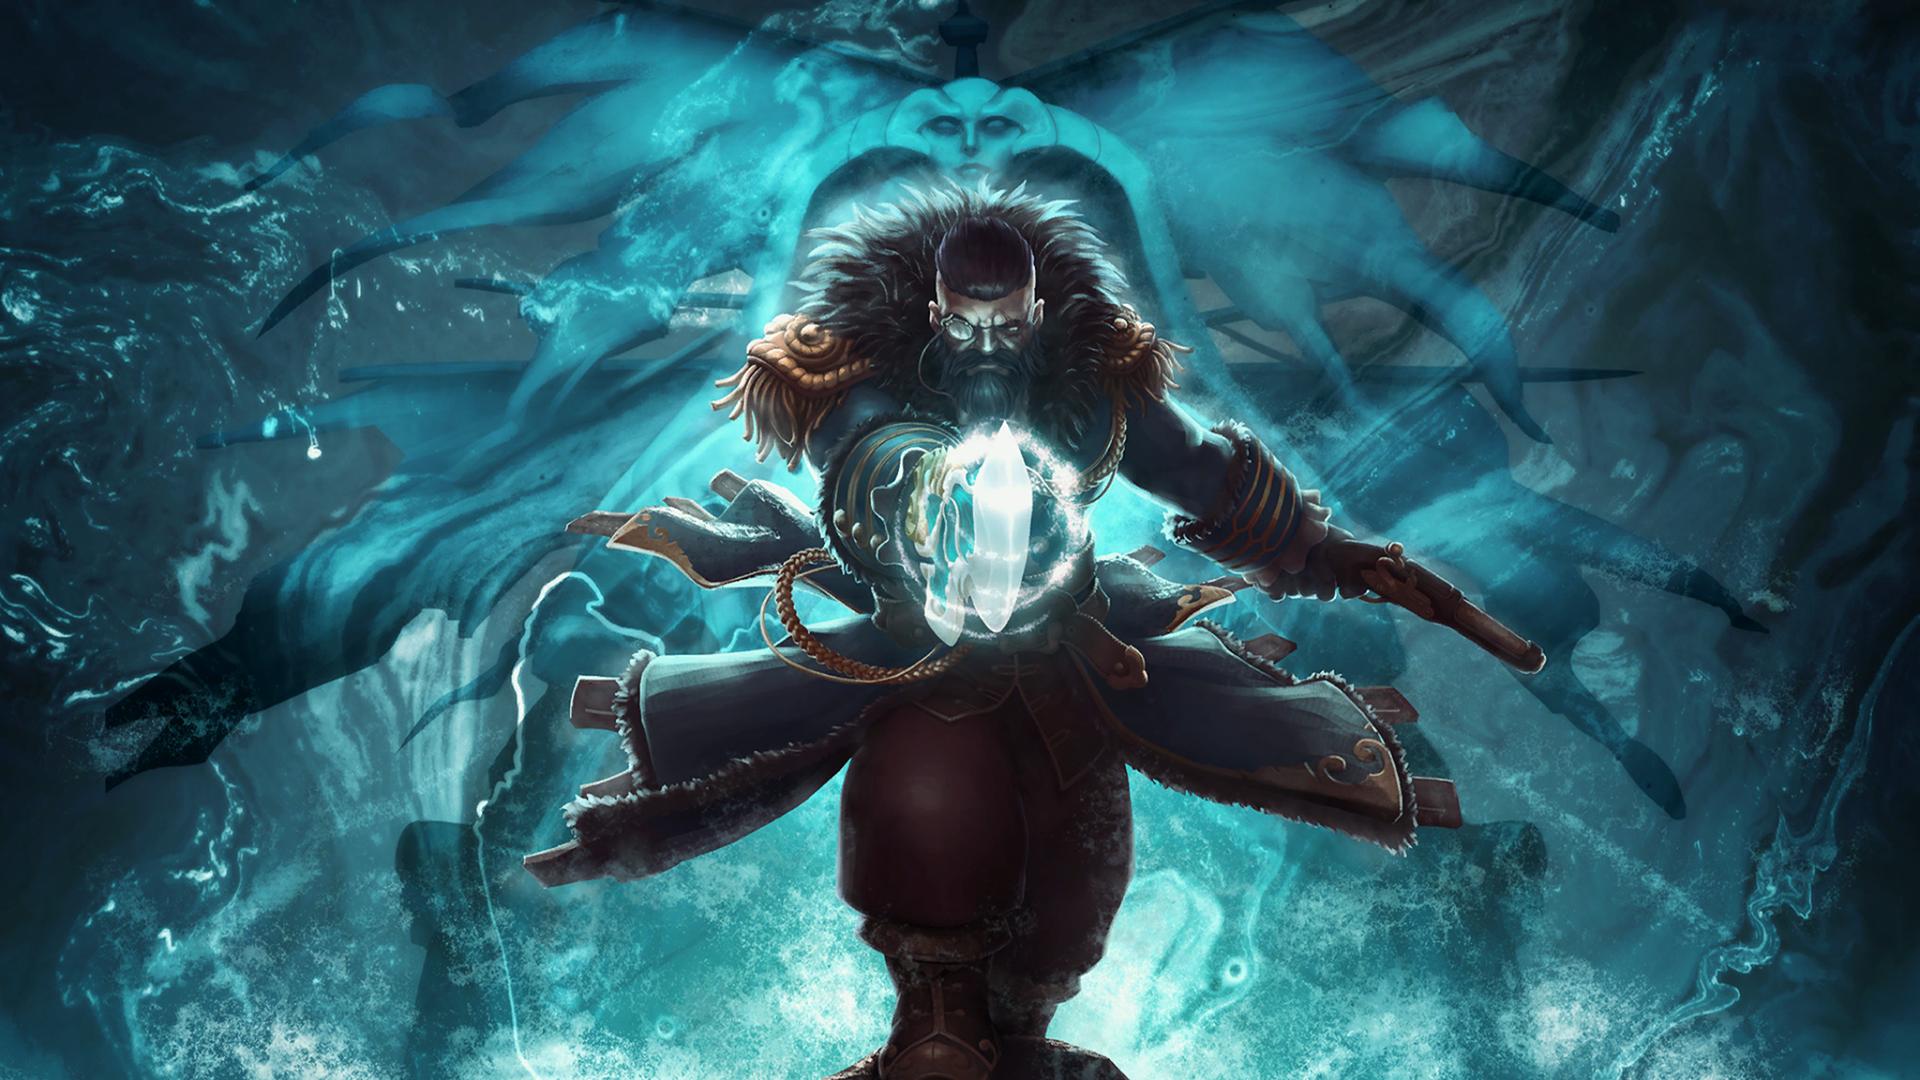 Wallpaper Underwater Dota 2 Mythology Kunkka Loading Screen